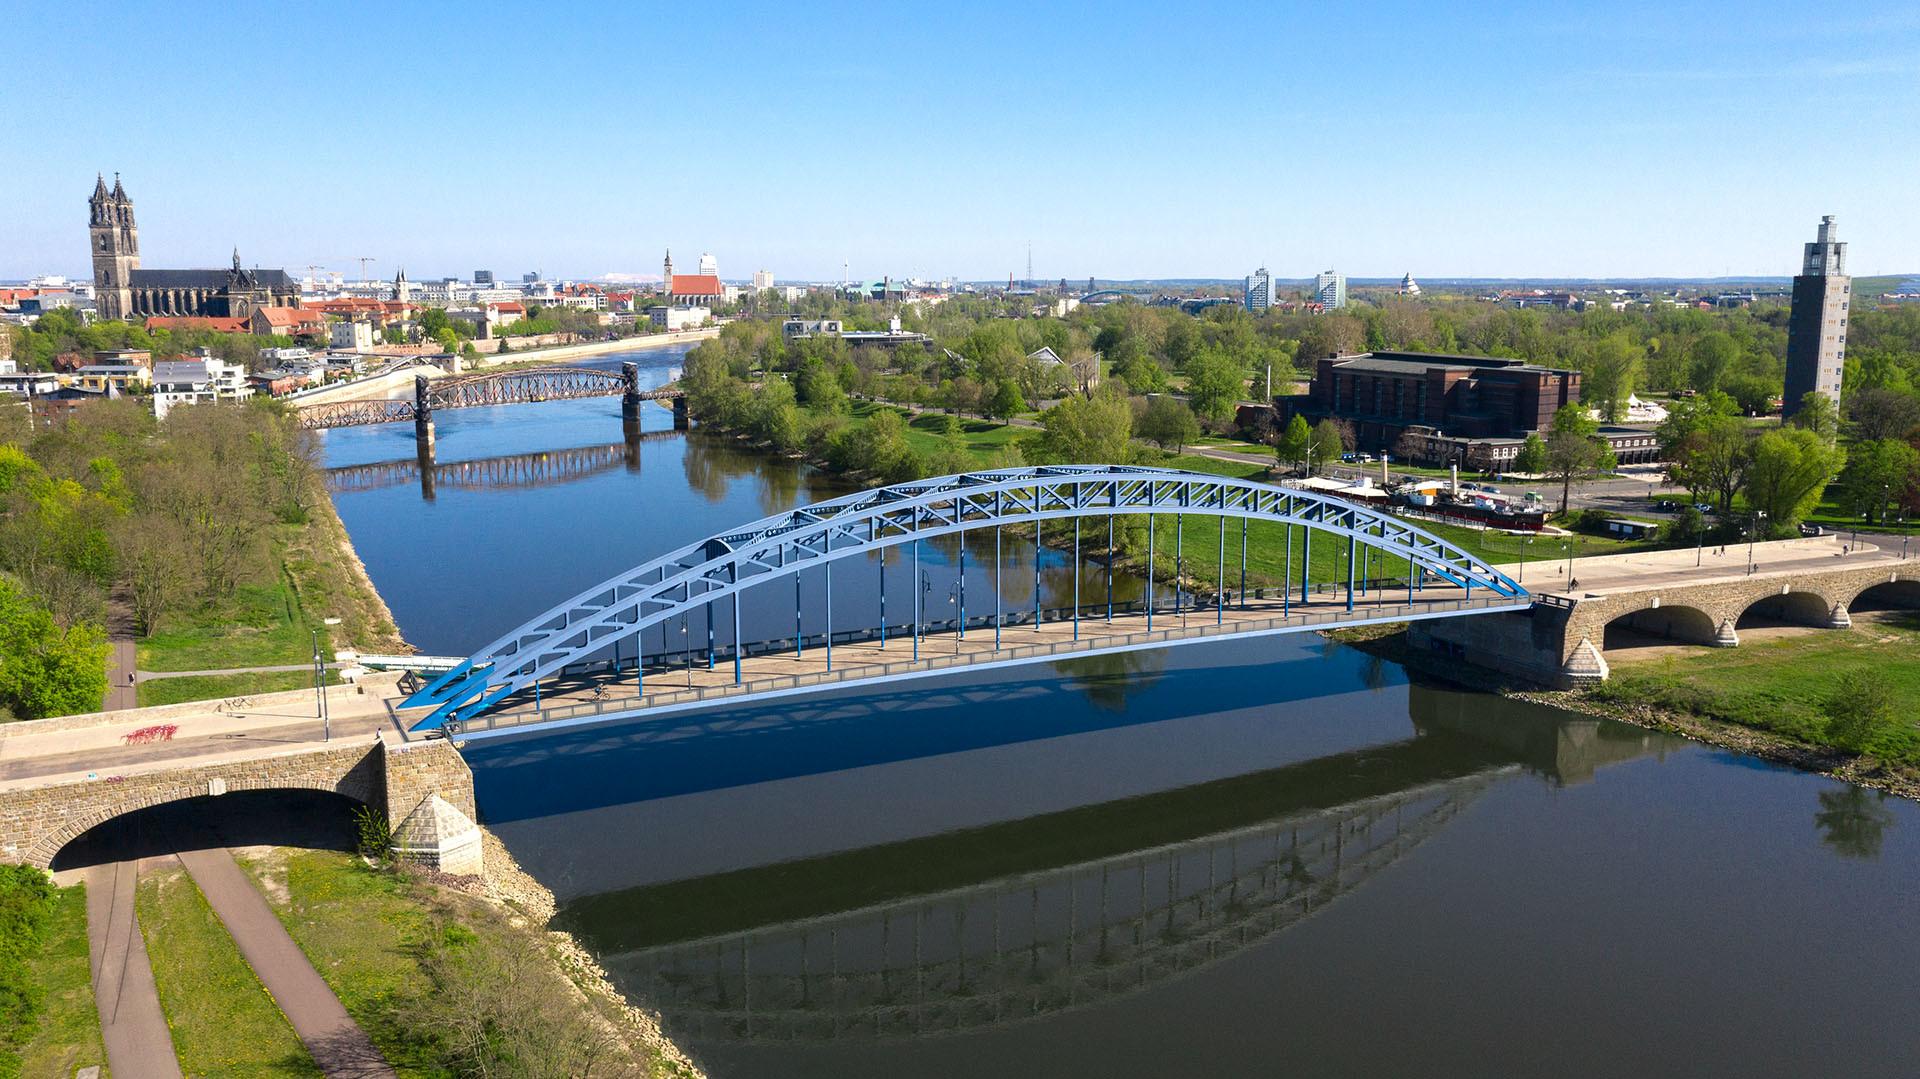 Sternbrücke Stadtpanorama Luftaufnahme